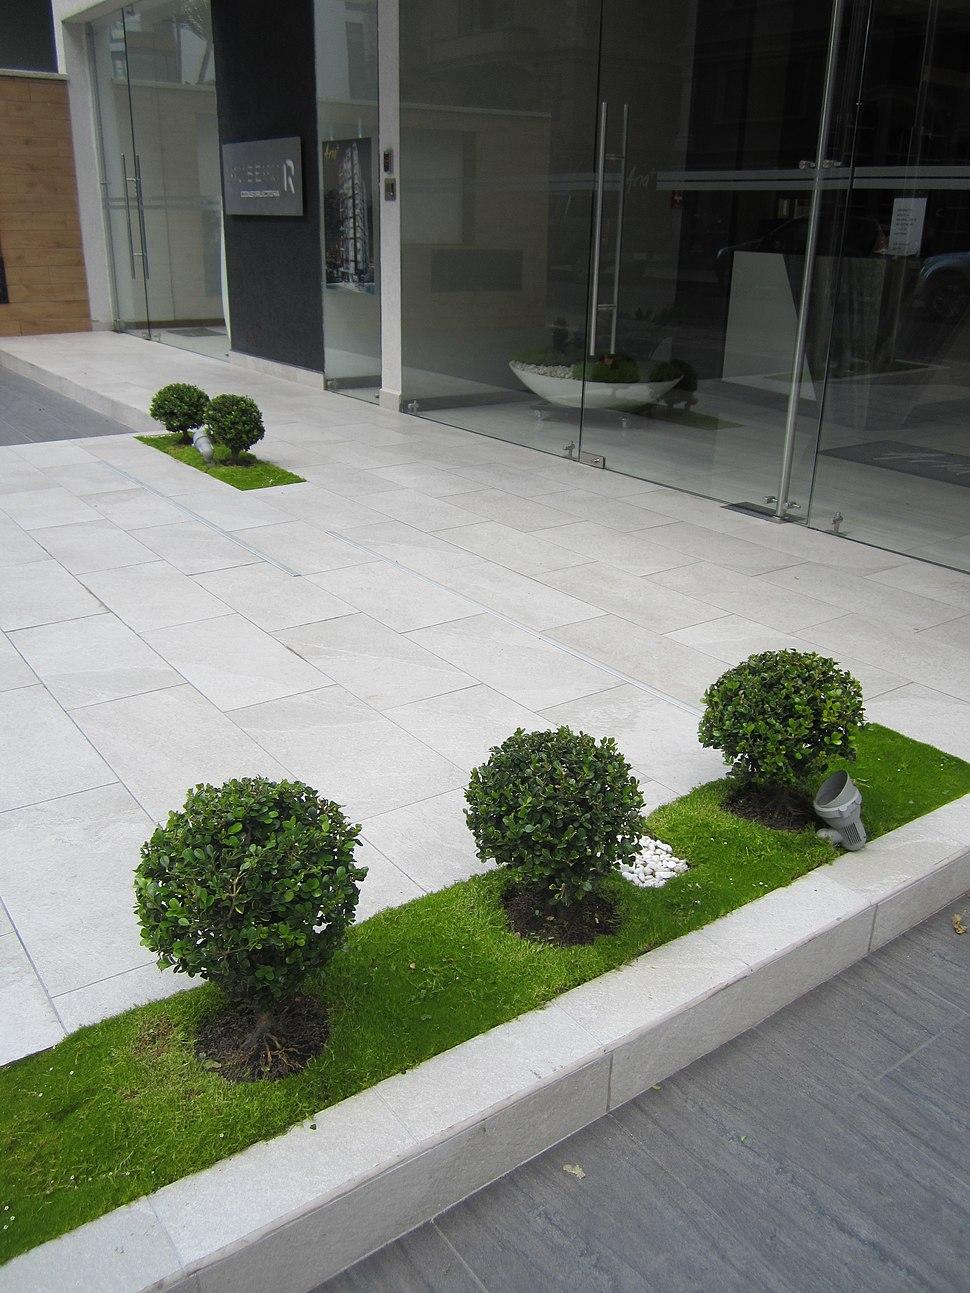 Modern Building in Quito, capital city of Ecuador, five bushes